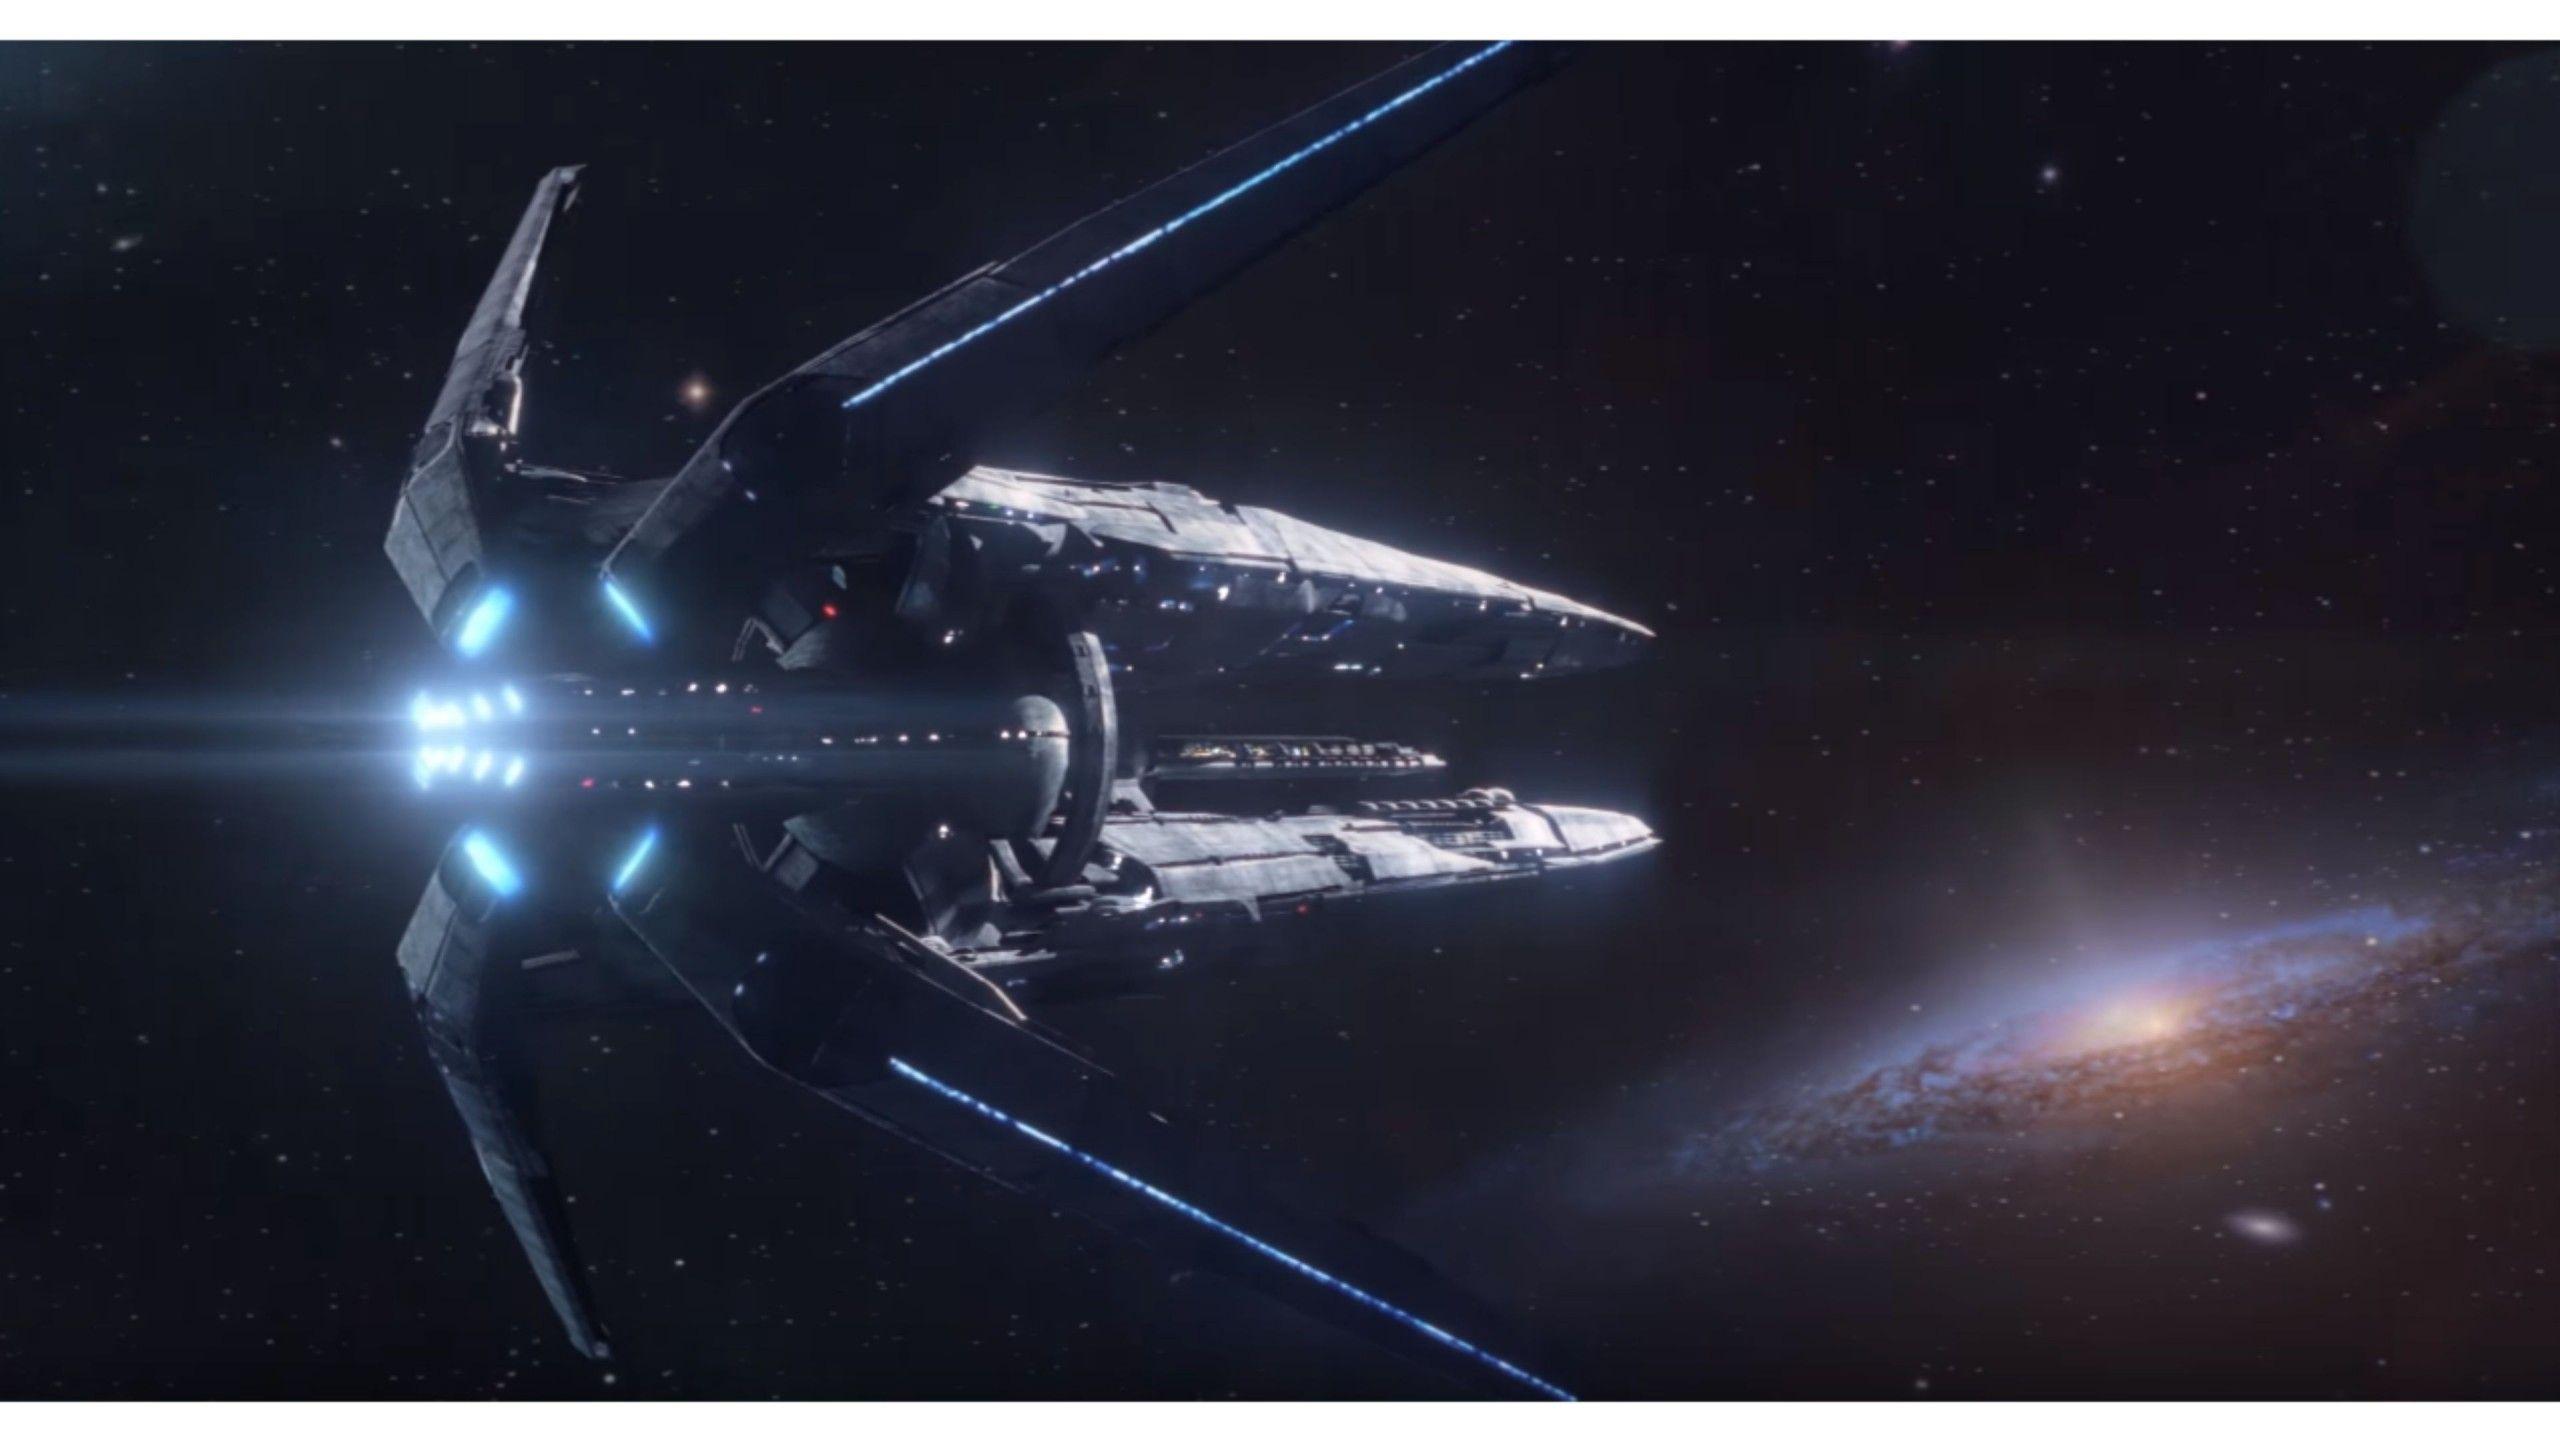 E3 Gameplay Mass Effect Andromeda 4k Wallpaper Free 4k Wallpaper Mass Effect Mass Effect Ships Mass Effect Universe